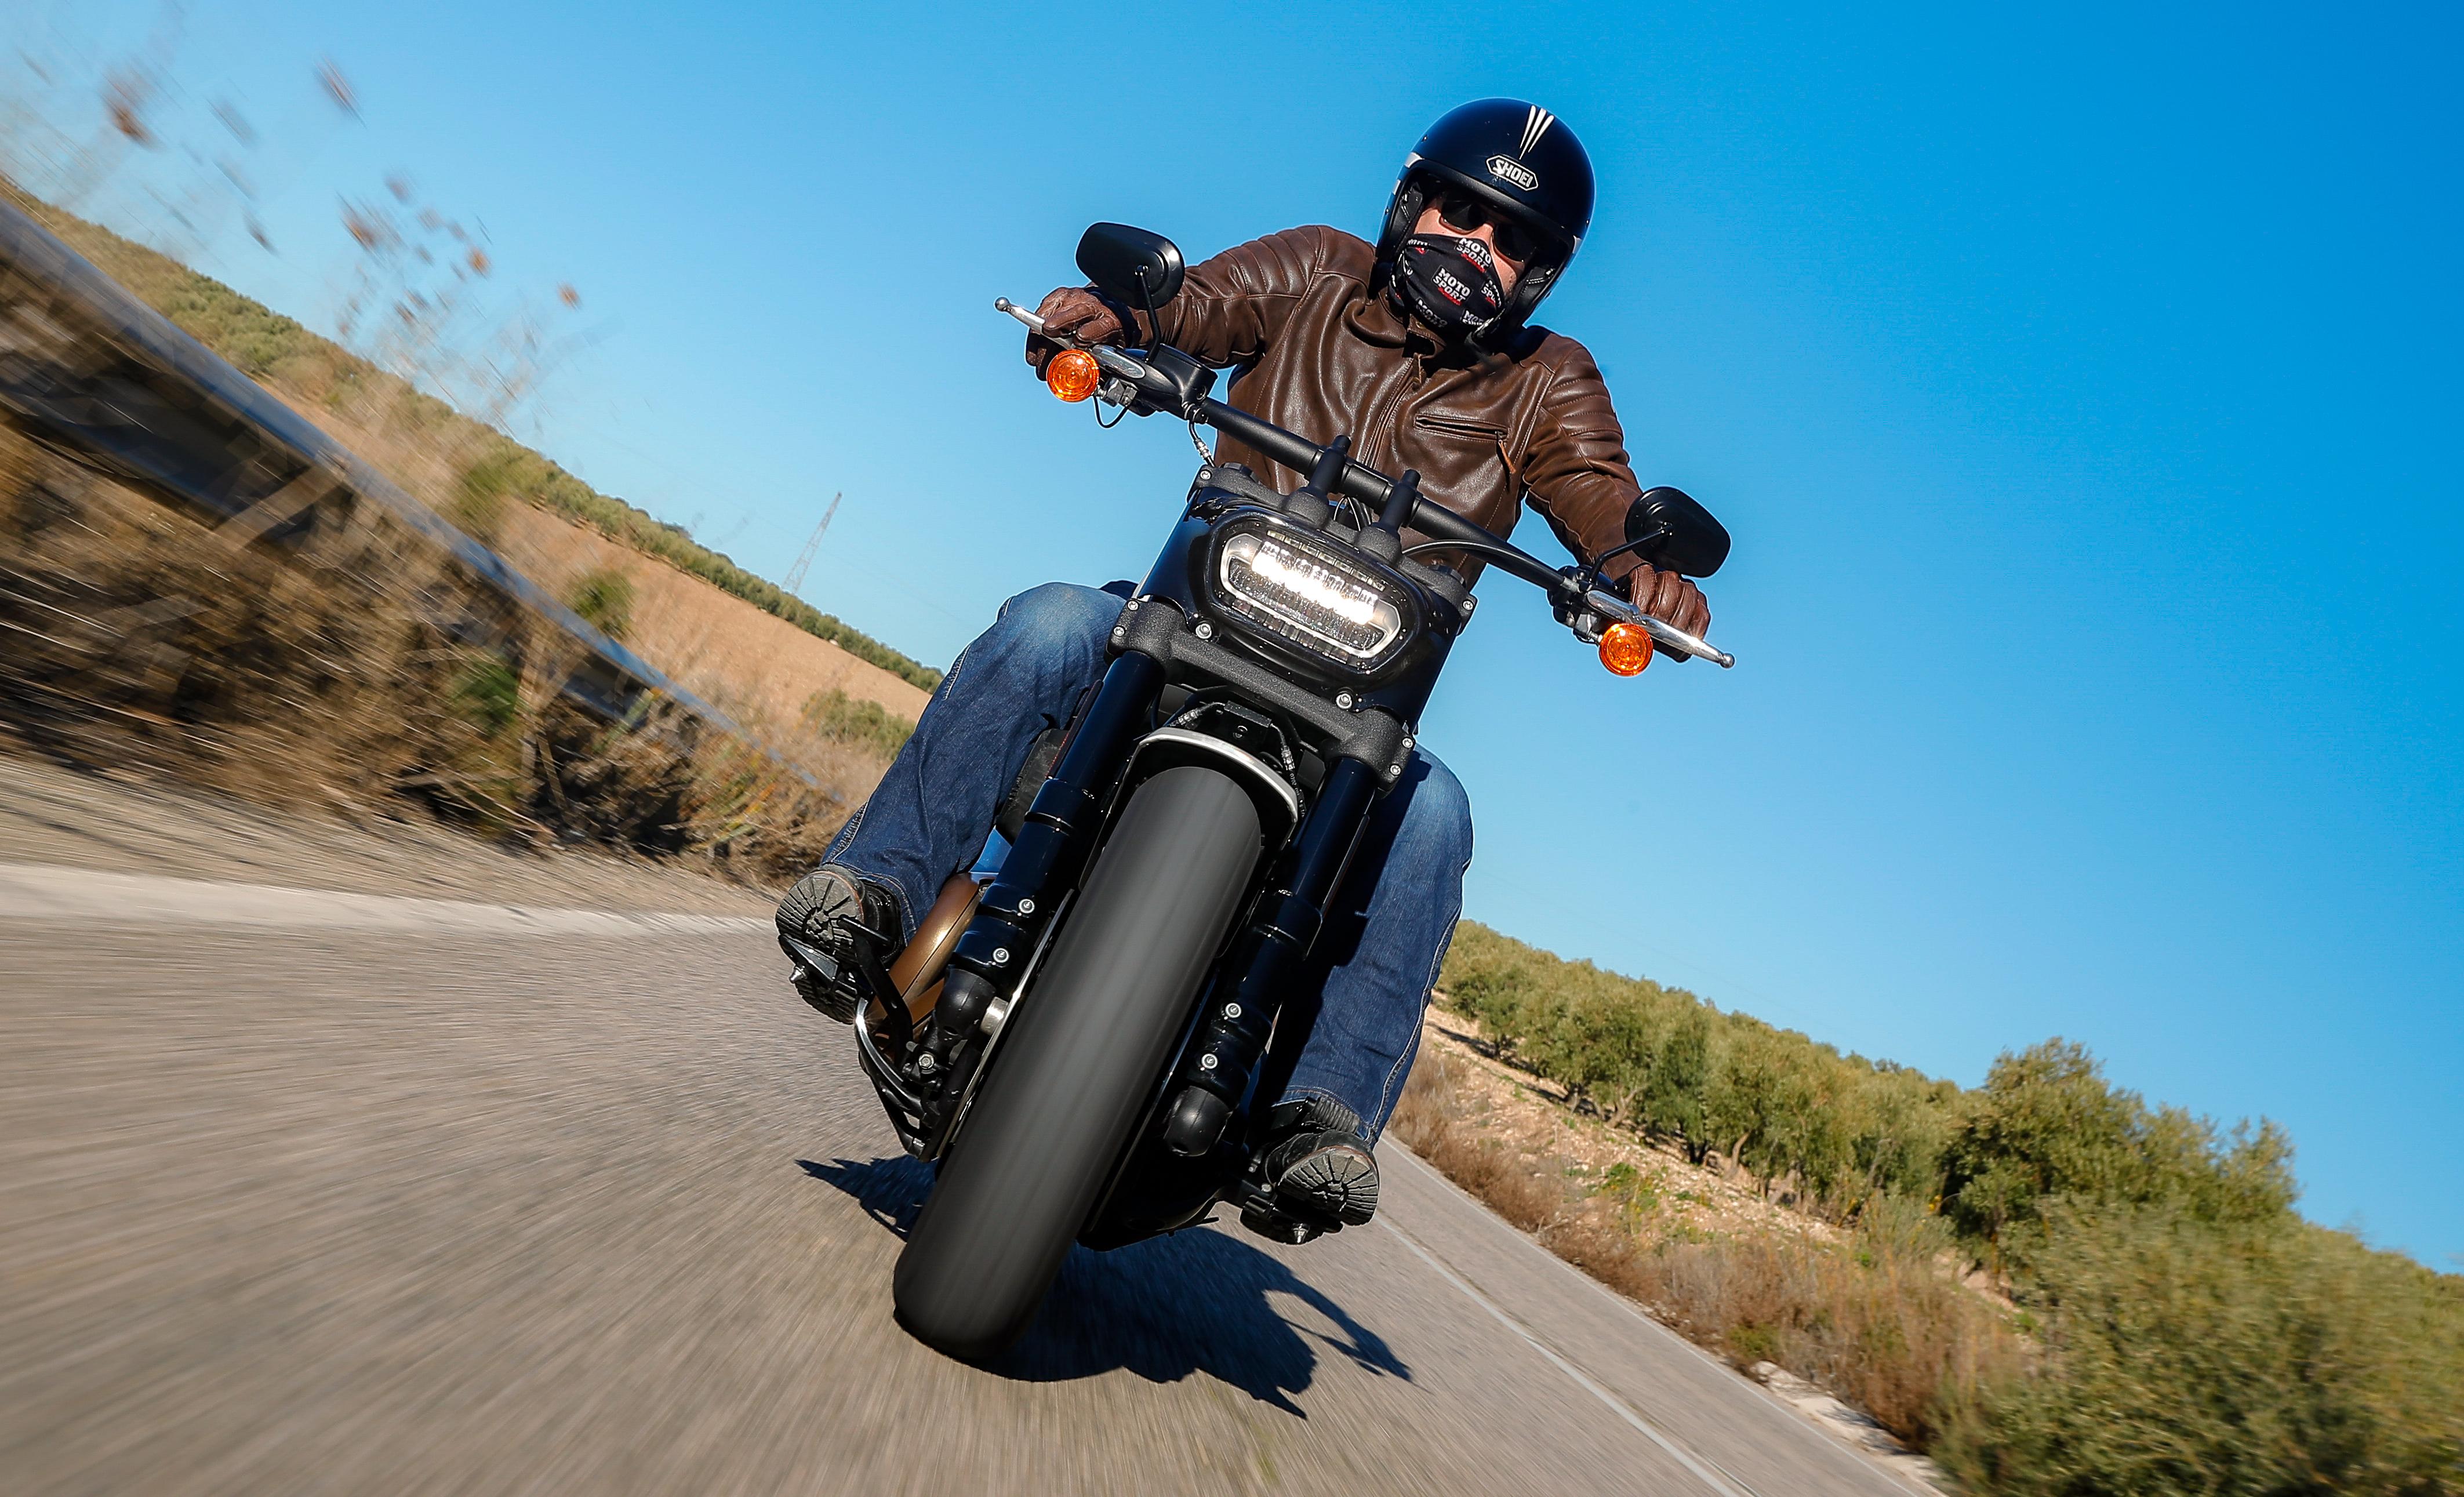 Harley Davidson Fat Bob 114 ActuMoto Mathias Deshusses